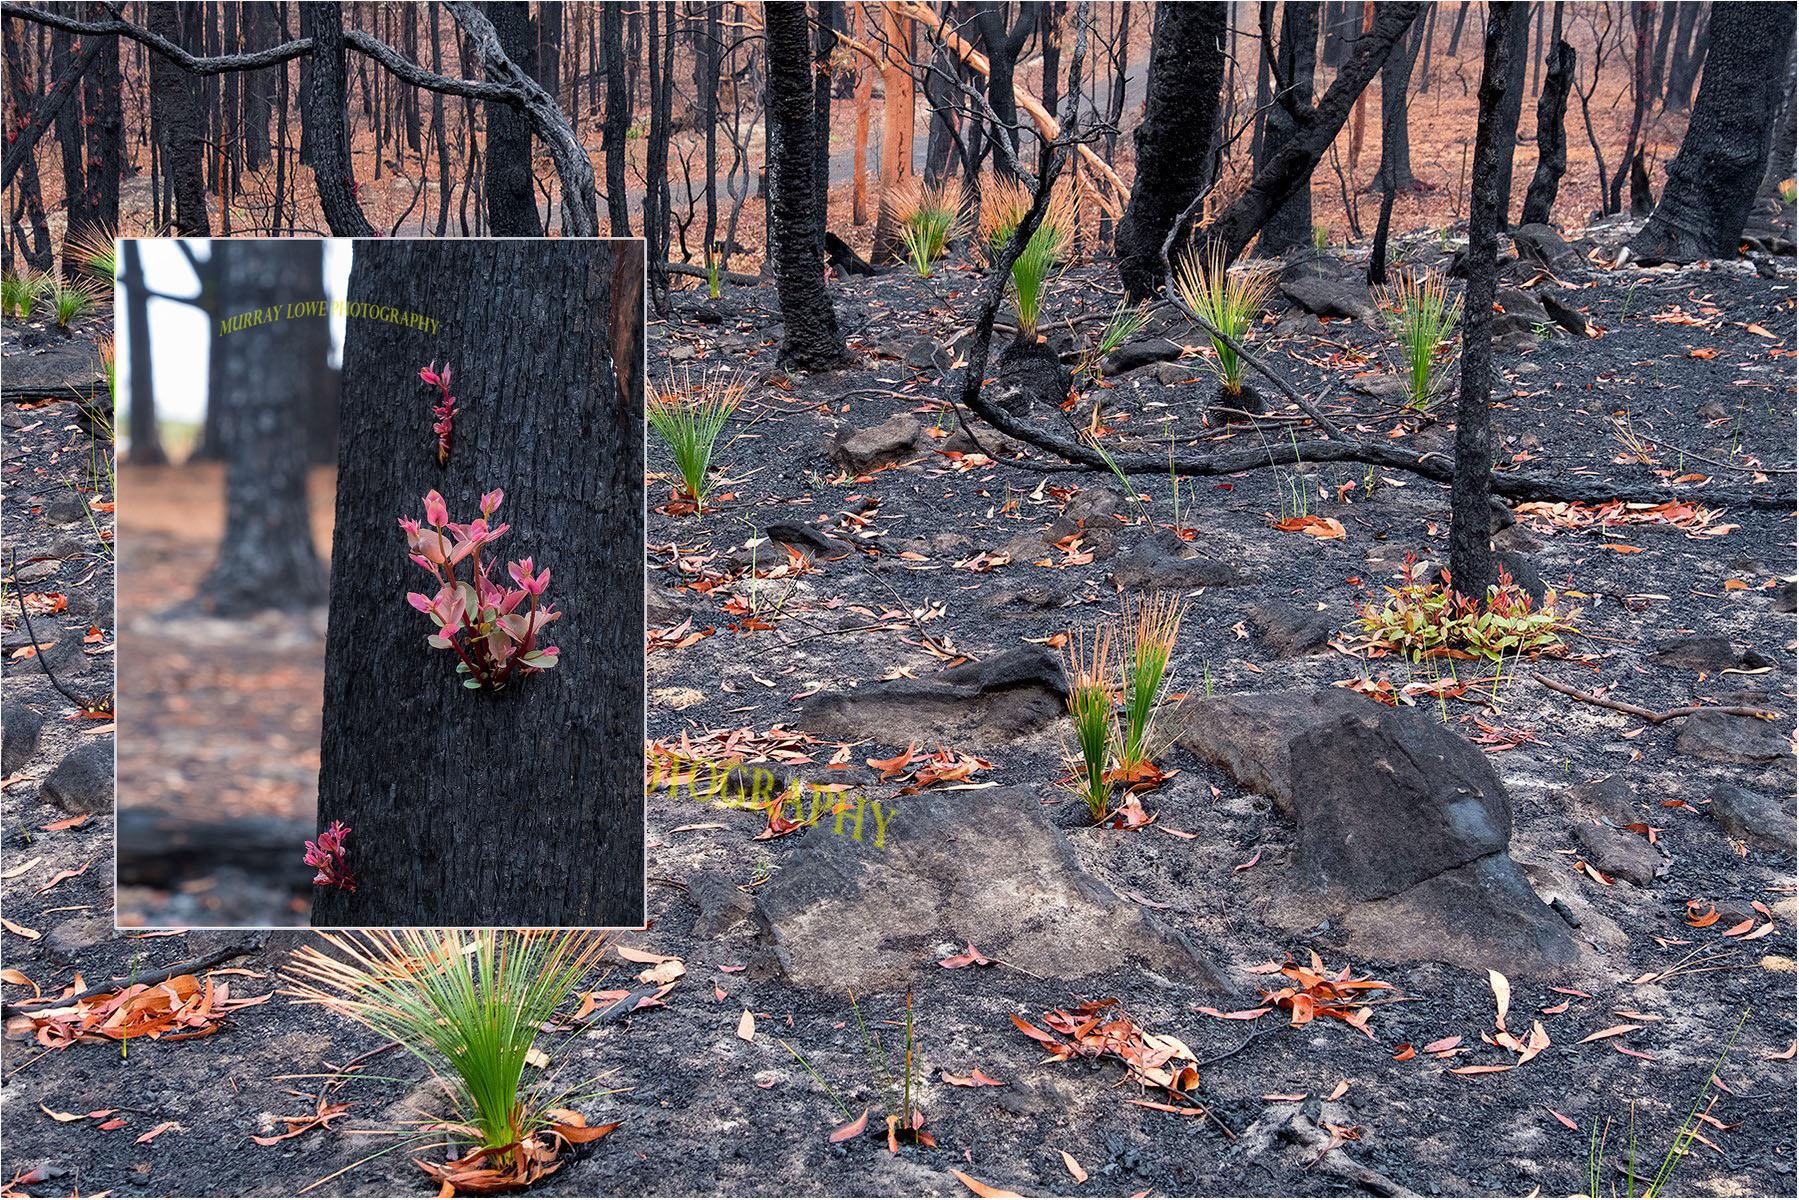 Photographer Captures Incredible Photos Of Regrowing Plant Life After Australia's Devastating Bushfire Crisis